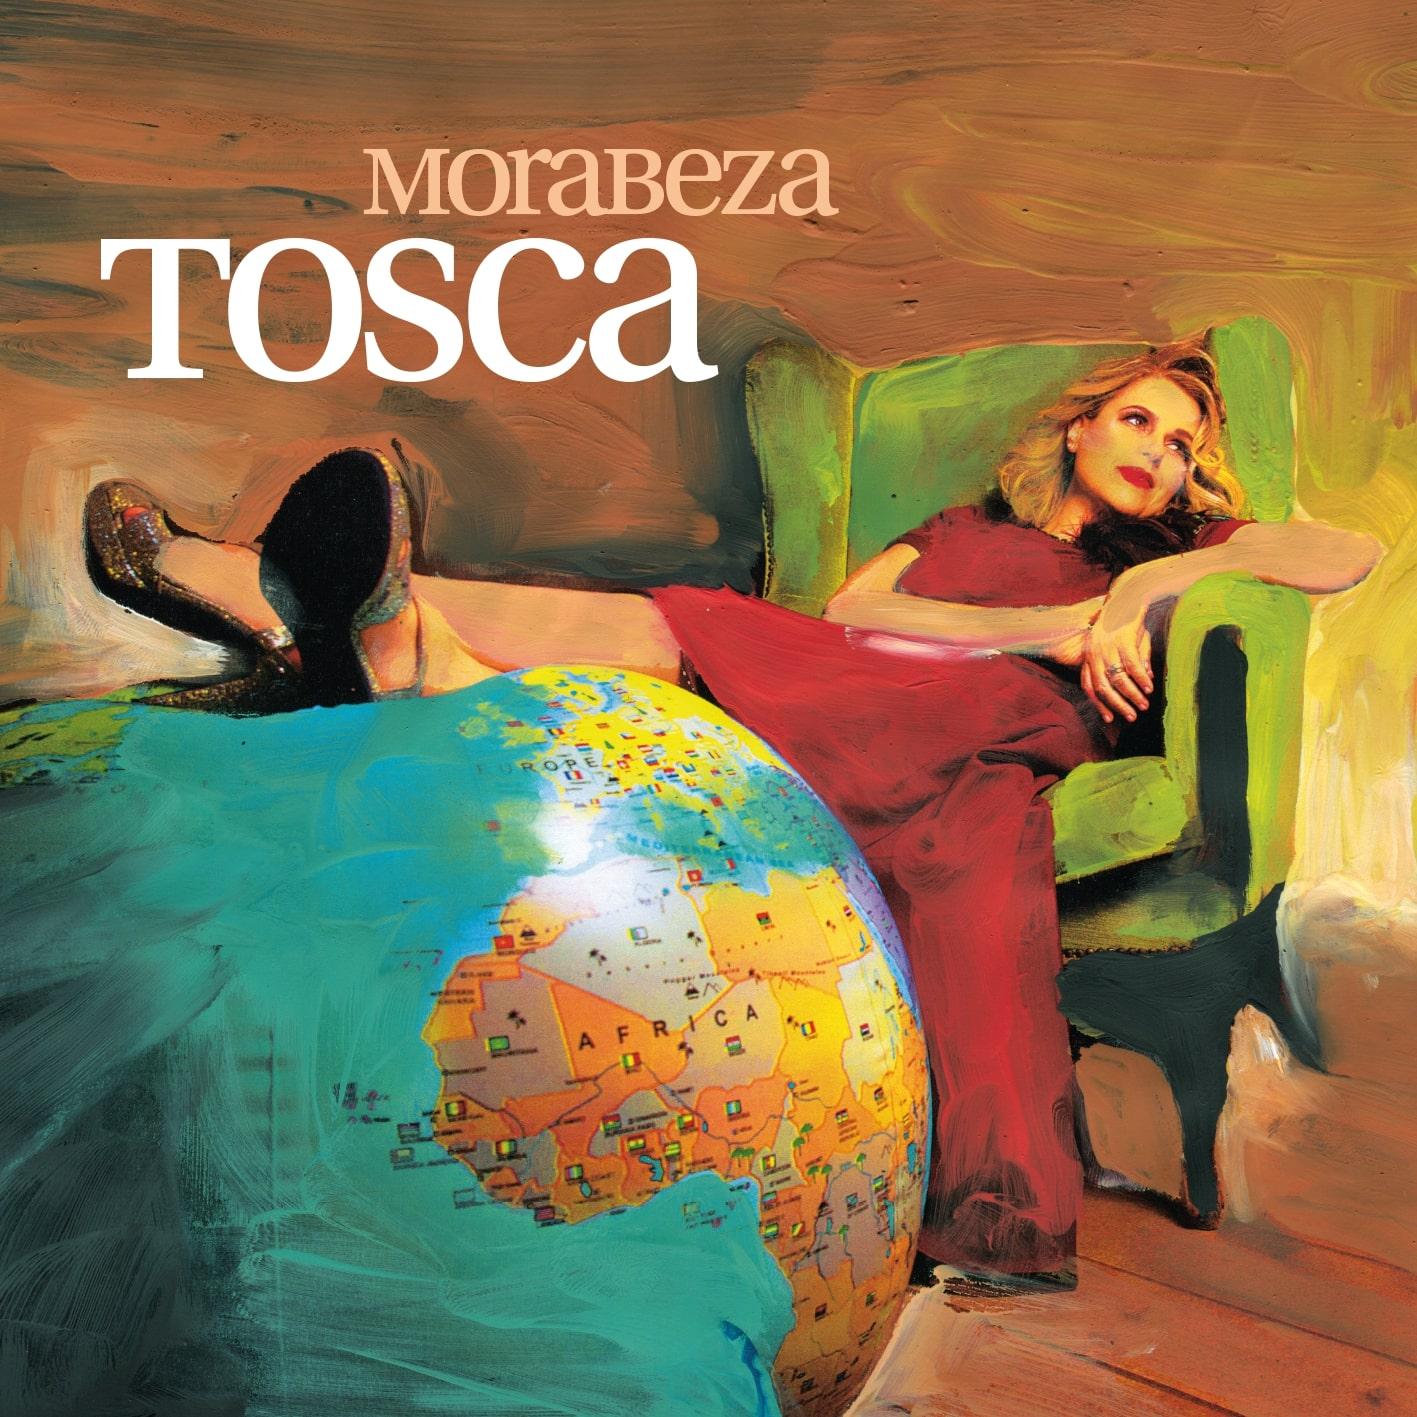 Morabeza_Tosca- recorded load studio at load studio